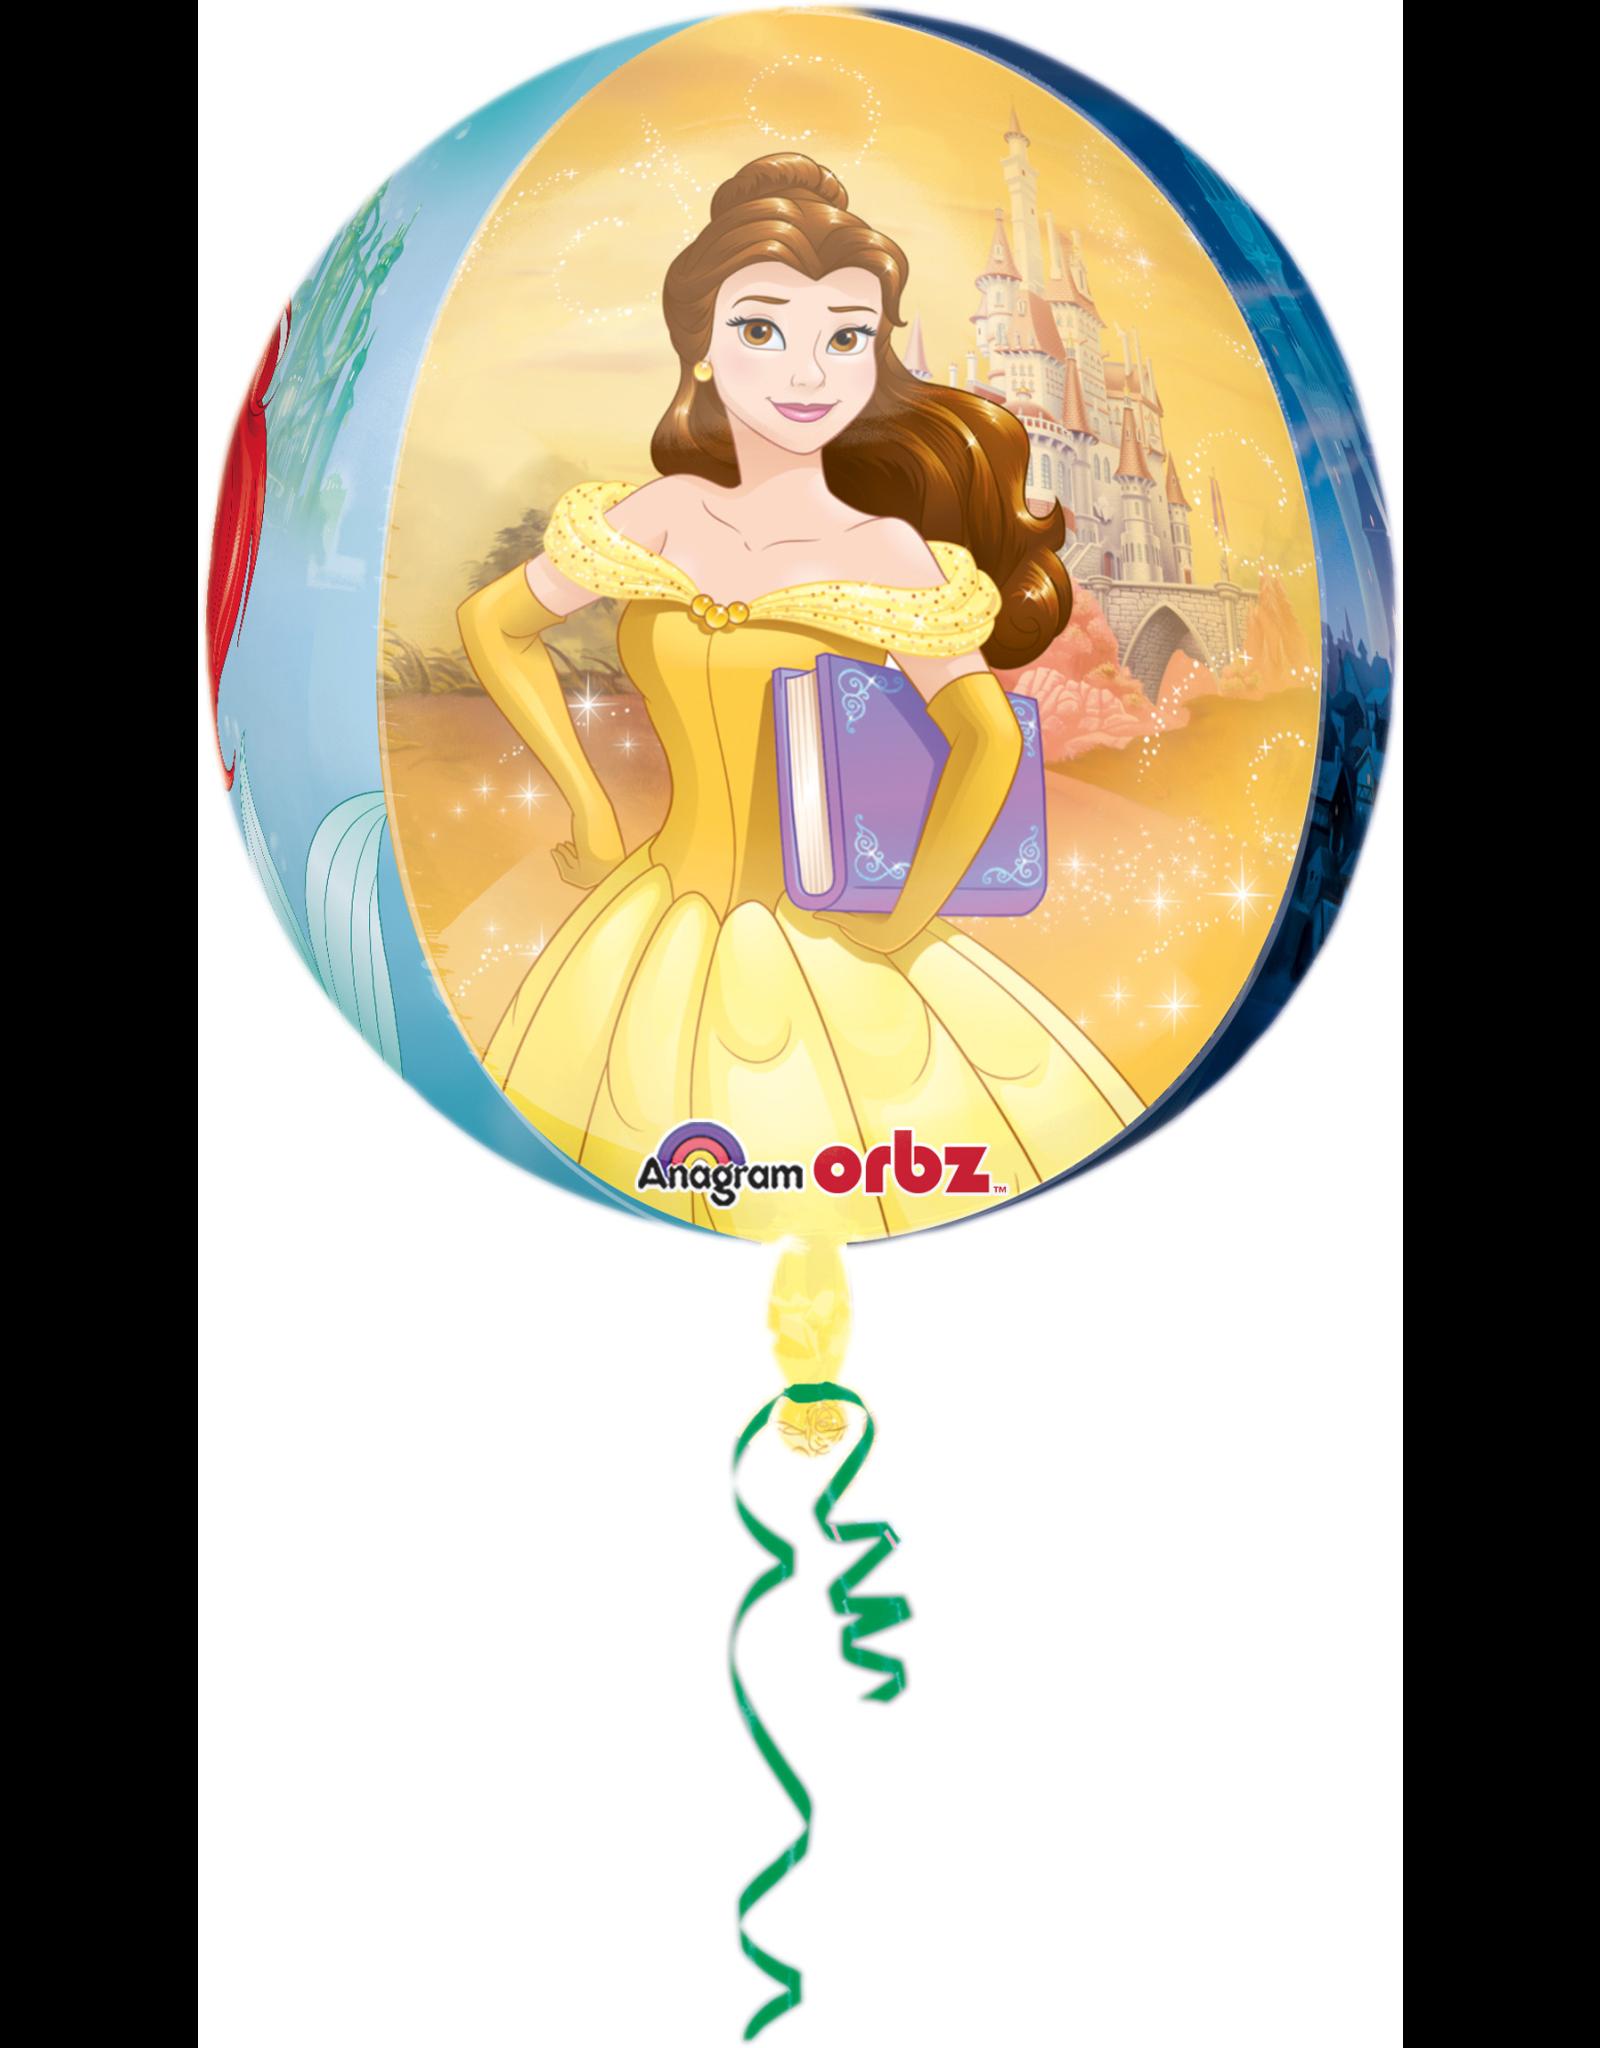 Amscan folieballon orbz disney princess 38 x 40 cm